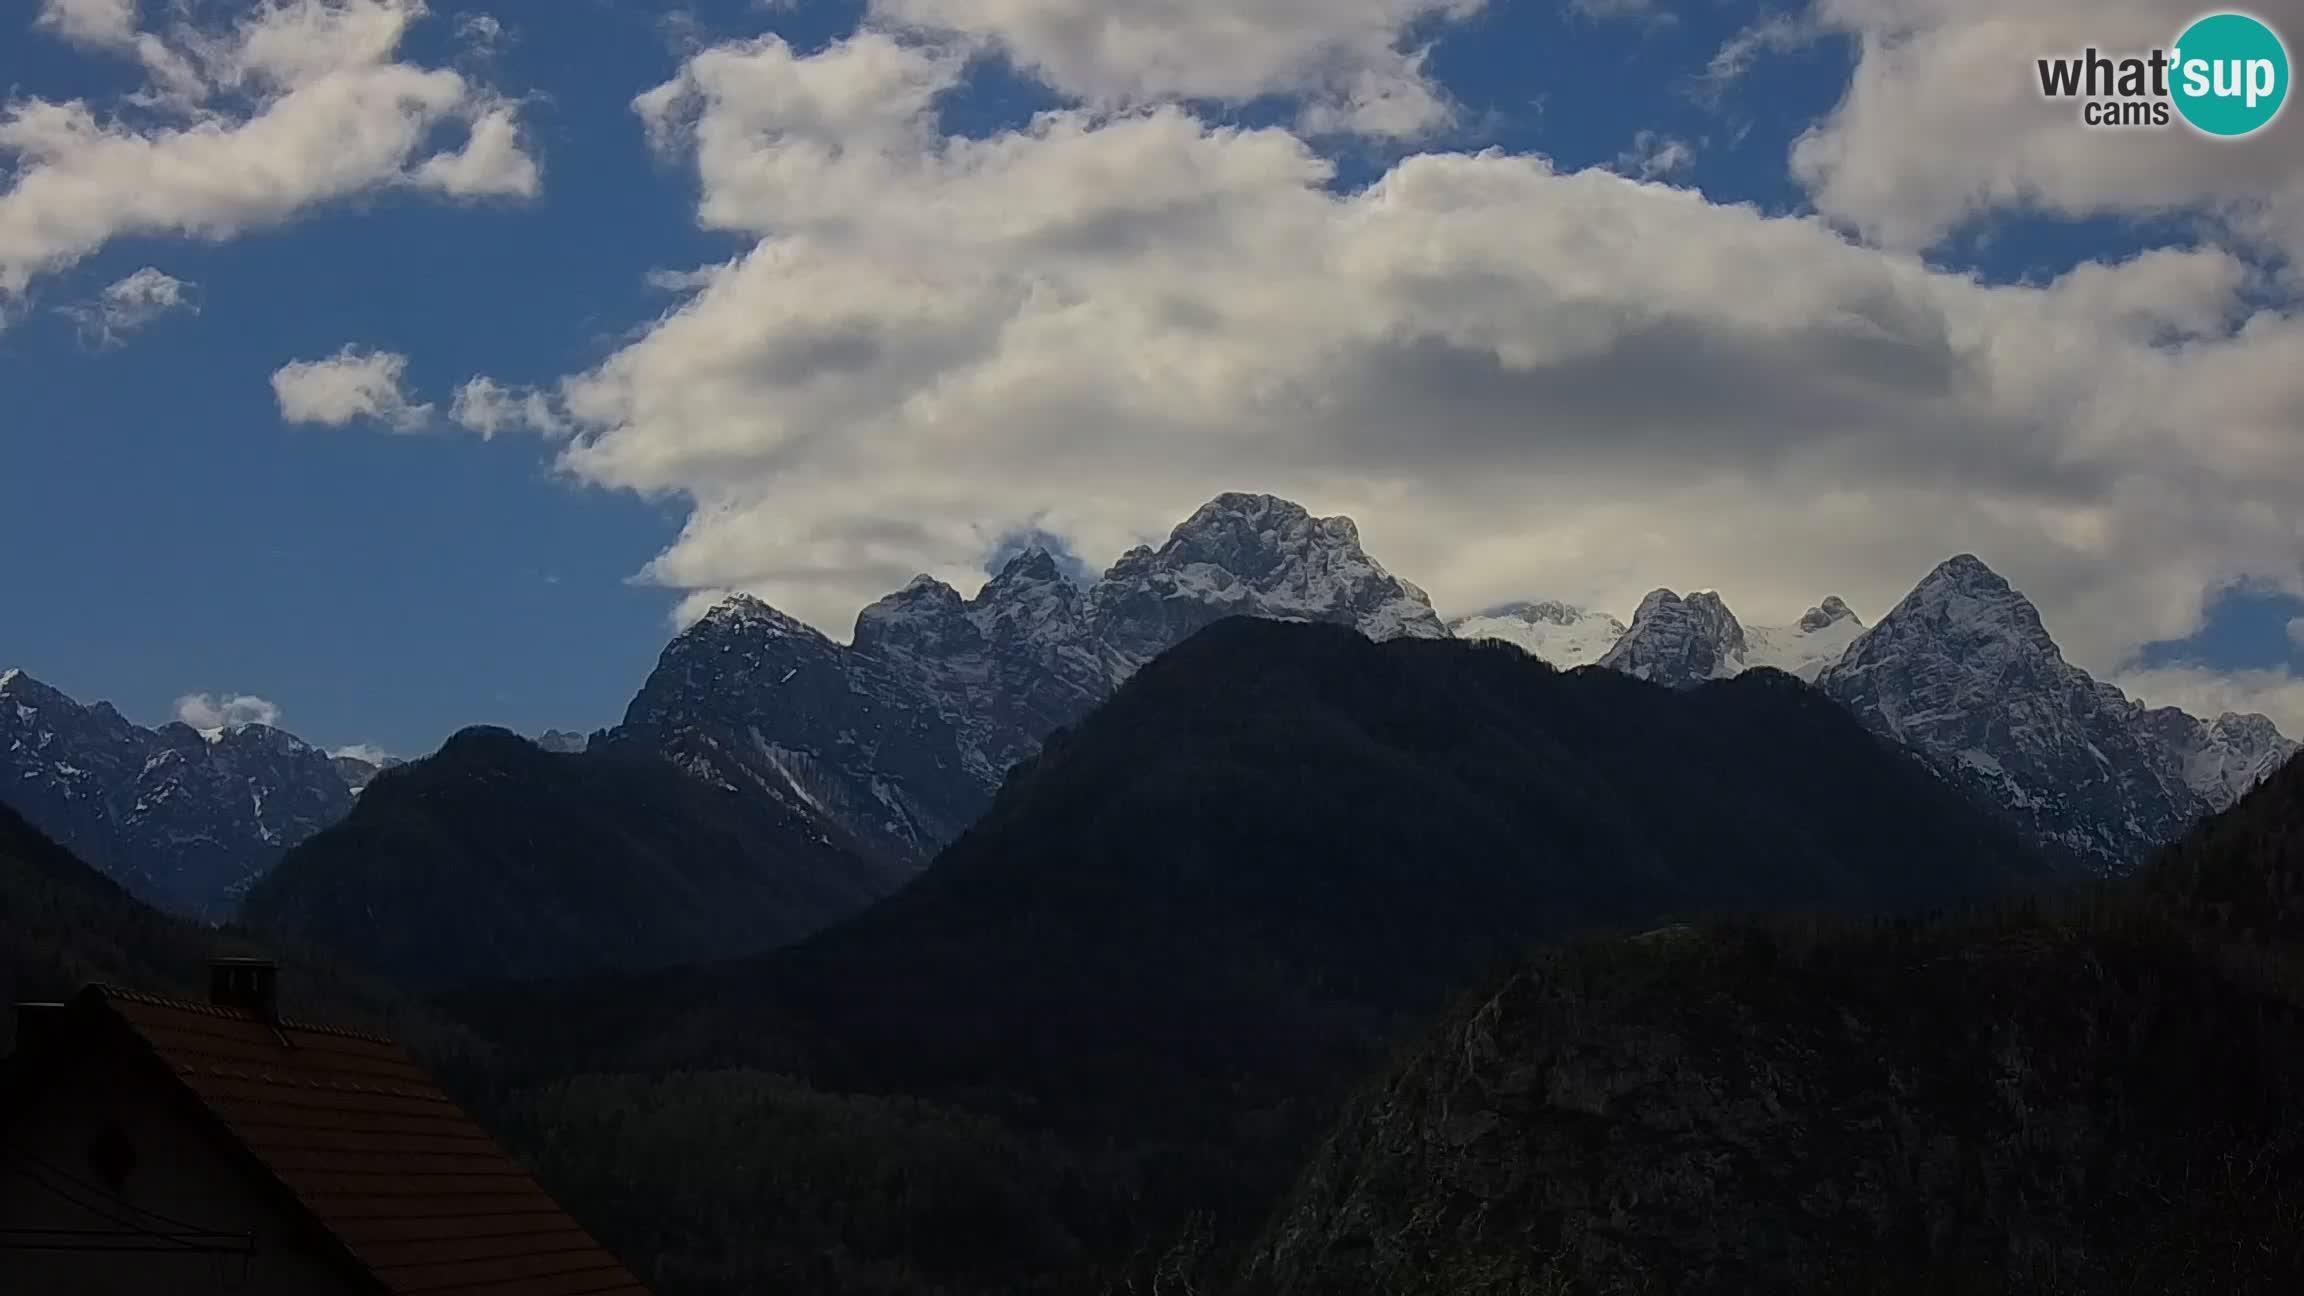 Dovje livecam – Vista del Triglav dagli appartameni Triglav